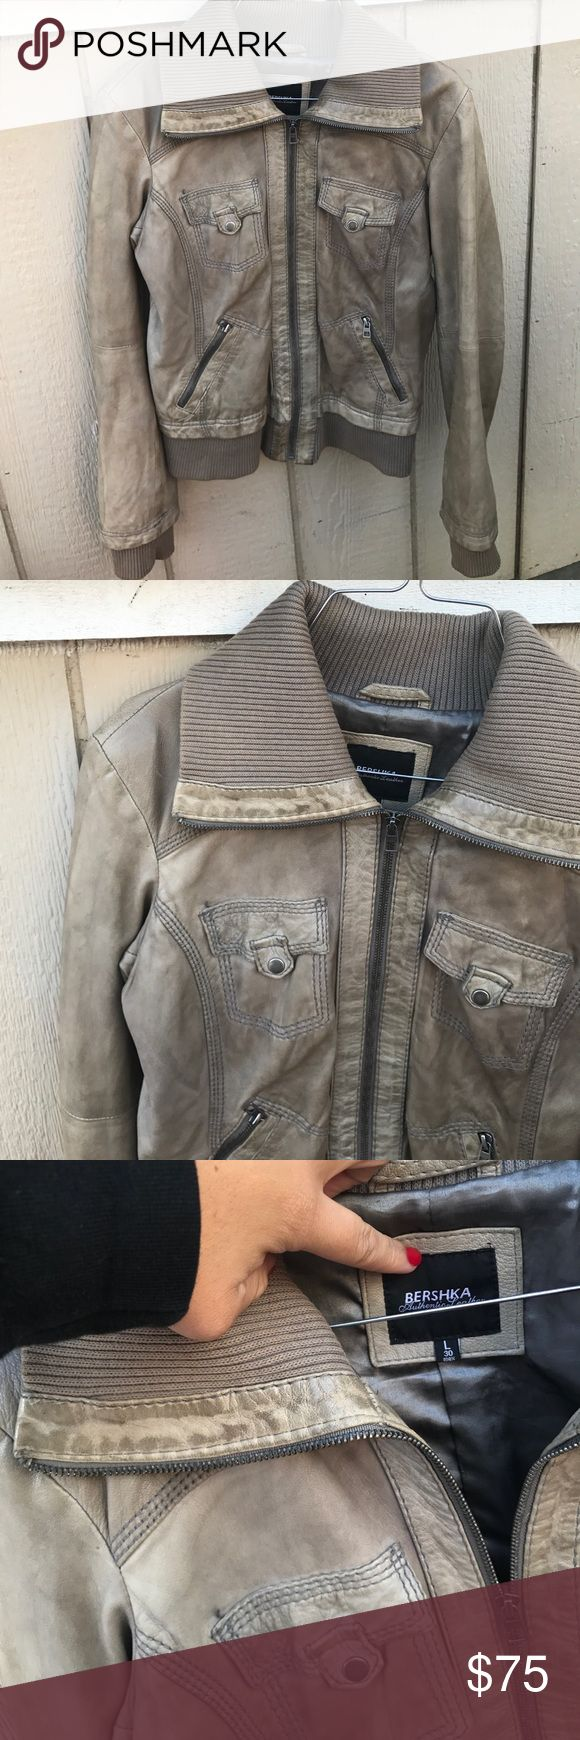 BERSHKA SZ L LEATHER JACKET TAUPE BEIGE ZIP UP Super cute and great condition Bershka Jackets & Coats